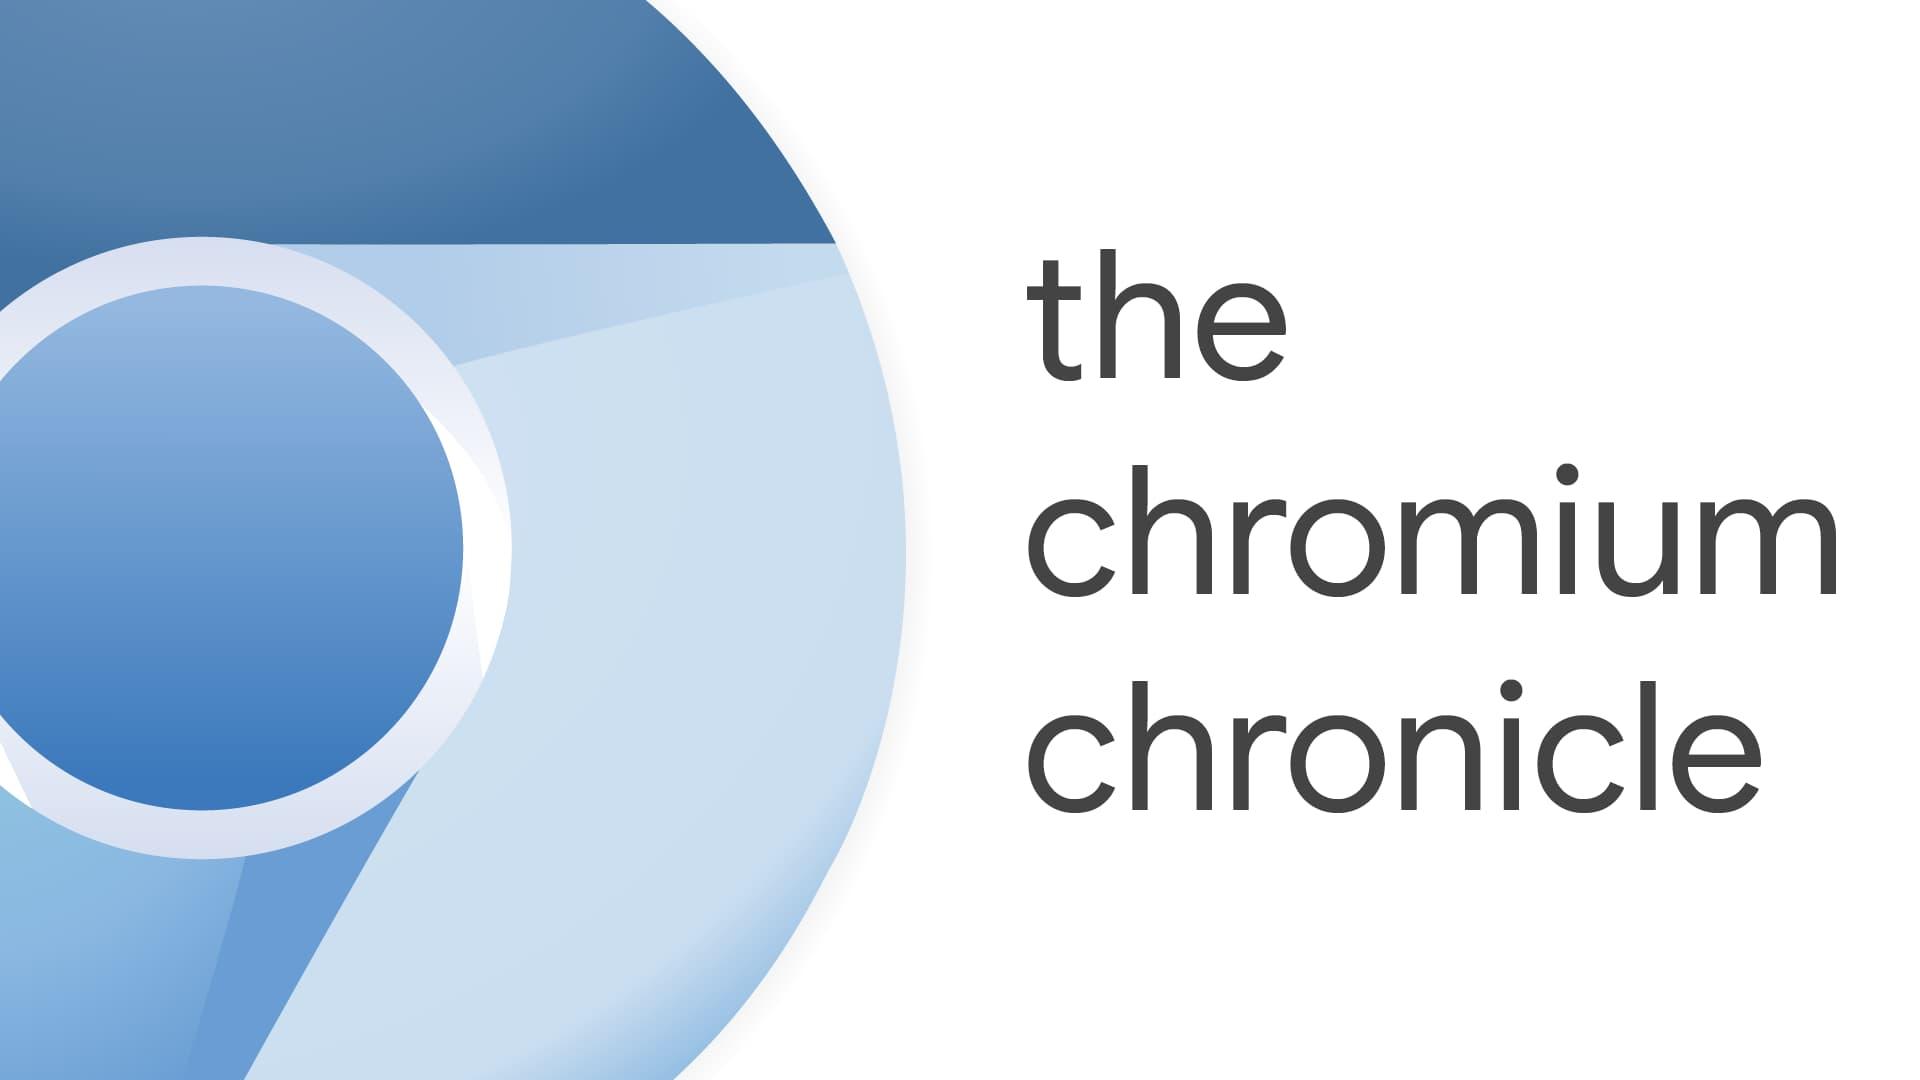 Chromium Chronicle image